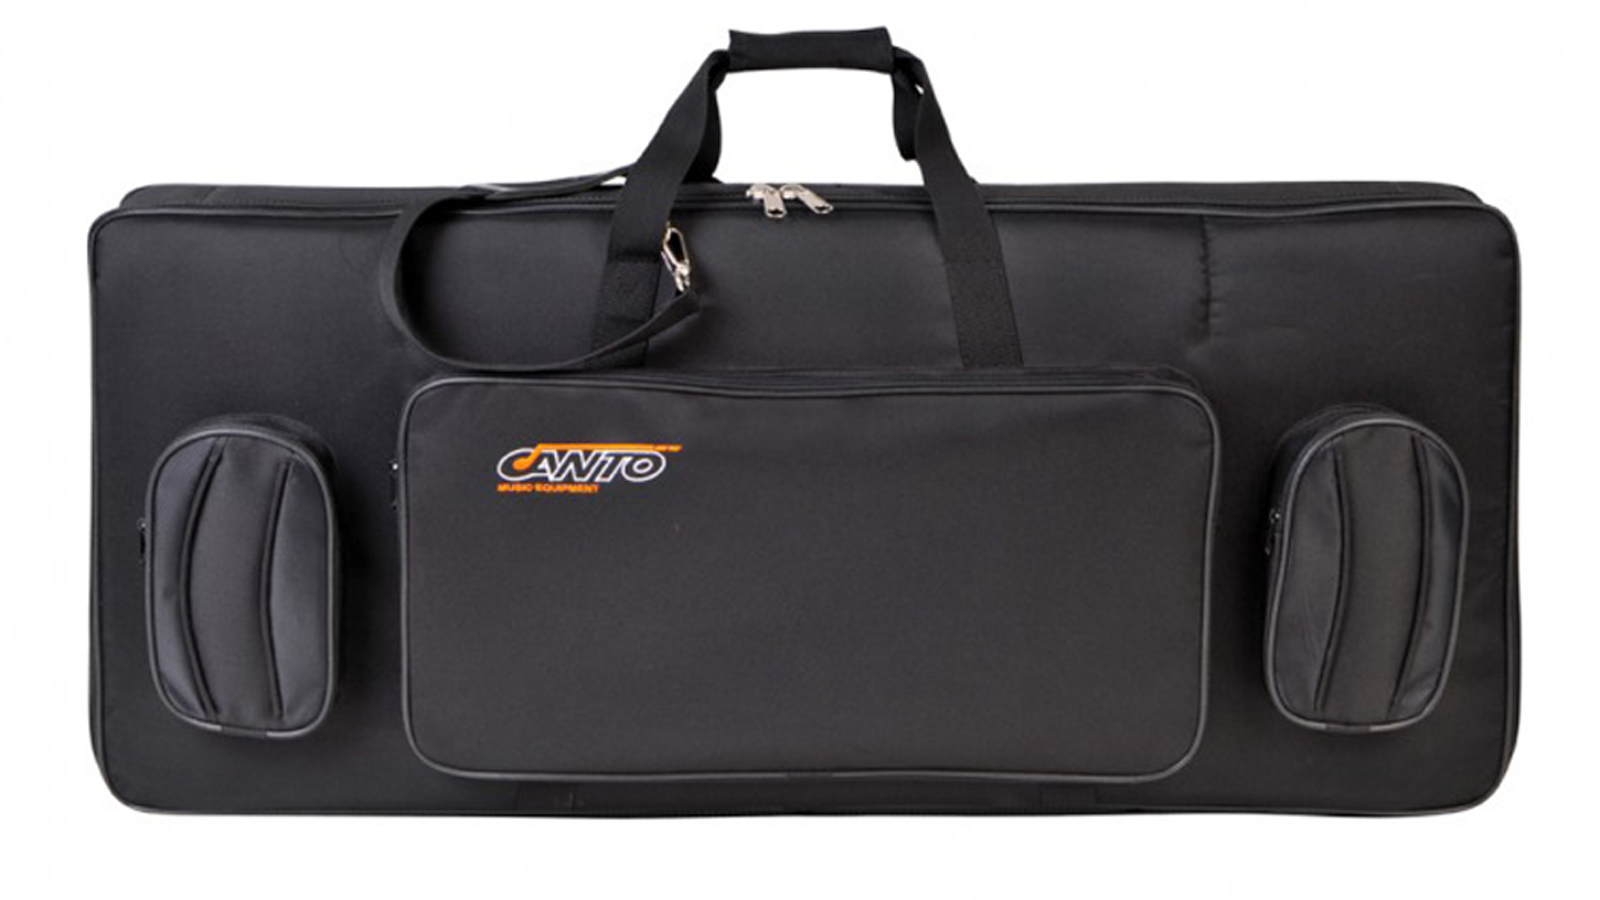 Canto Bags Keybord Tasche BK